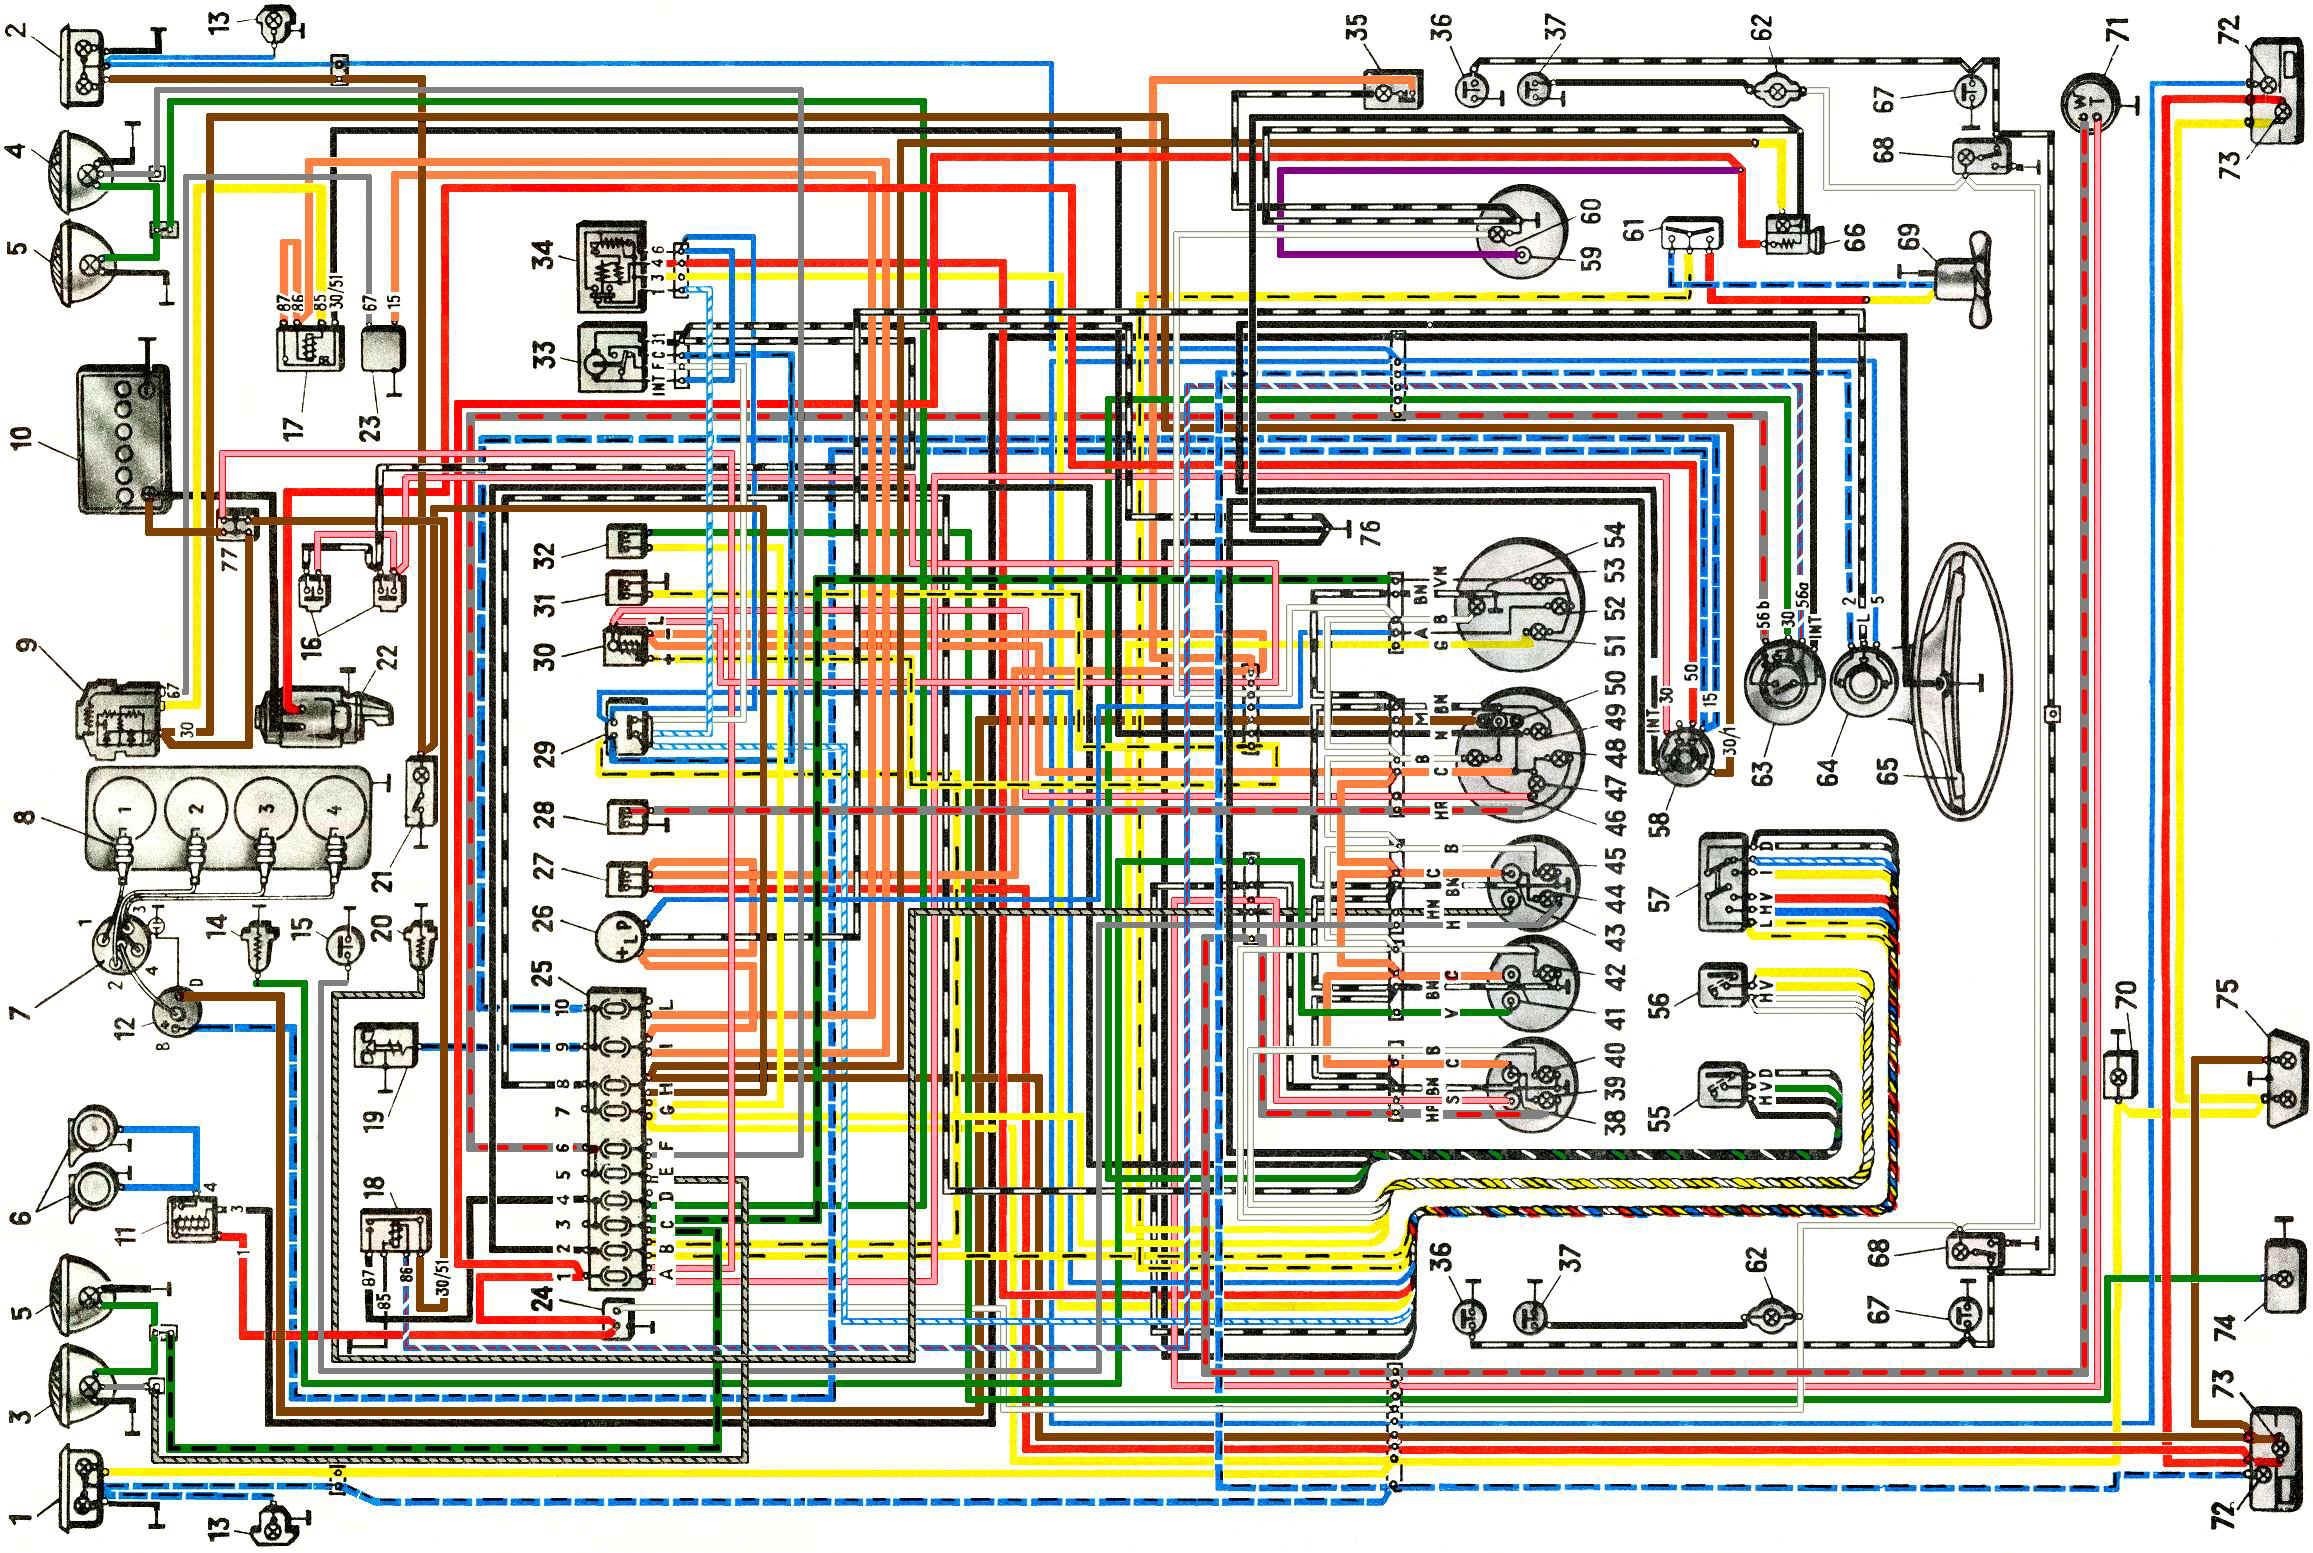 DataLife Engine Версия для печати Схема электрооборудования автомобиля ВАЗ-2103.